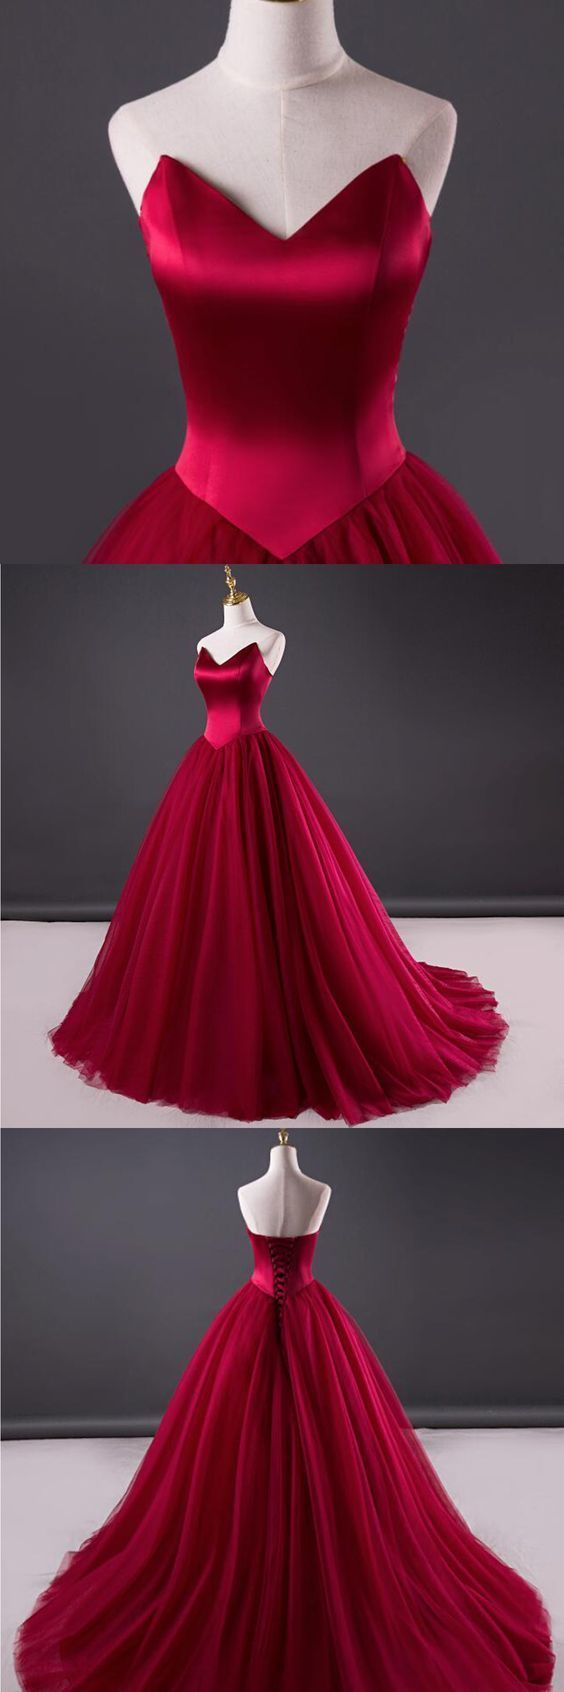 Charming sweetheart aline prom dresseslong prom dressescheap prom